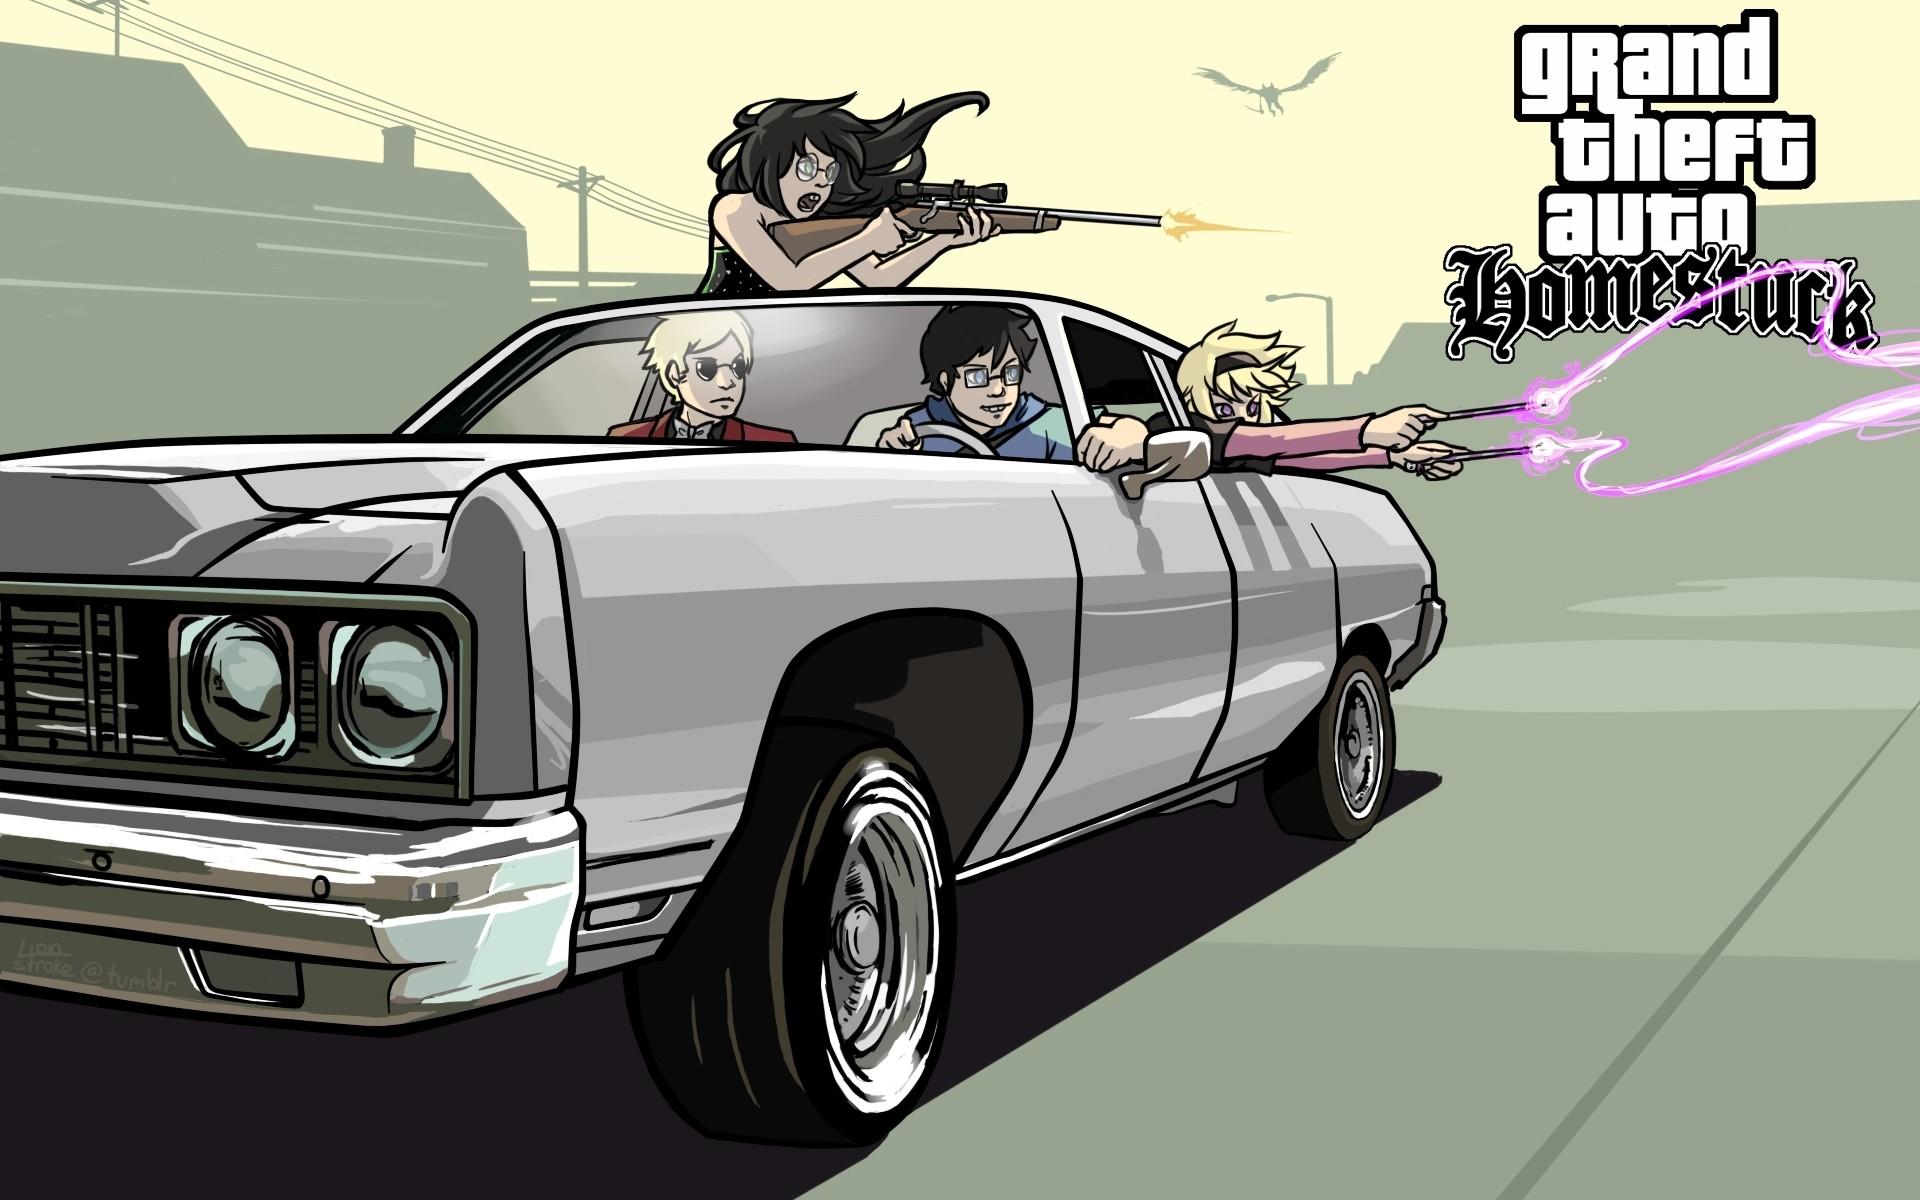 cars weapons grand theft auto sniper rifles homestuck gta san andreas john  egbert crossovers dave st